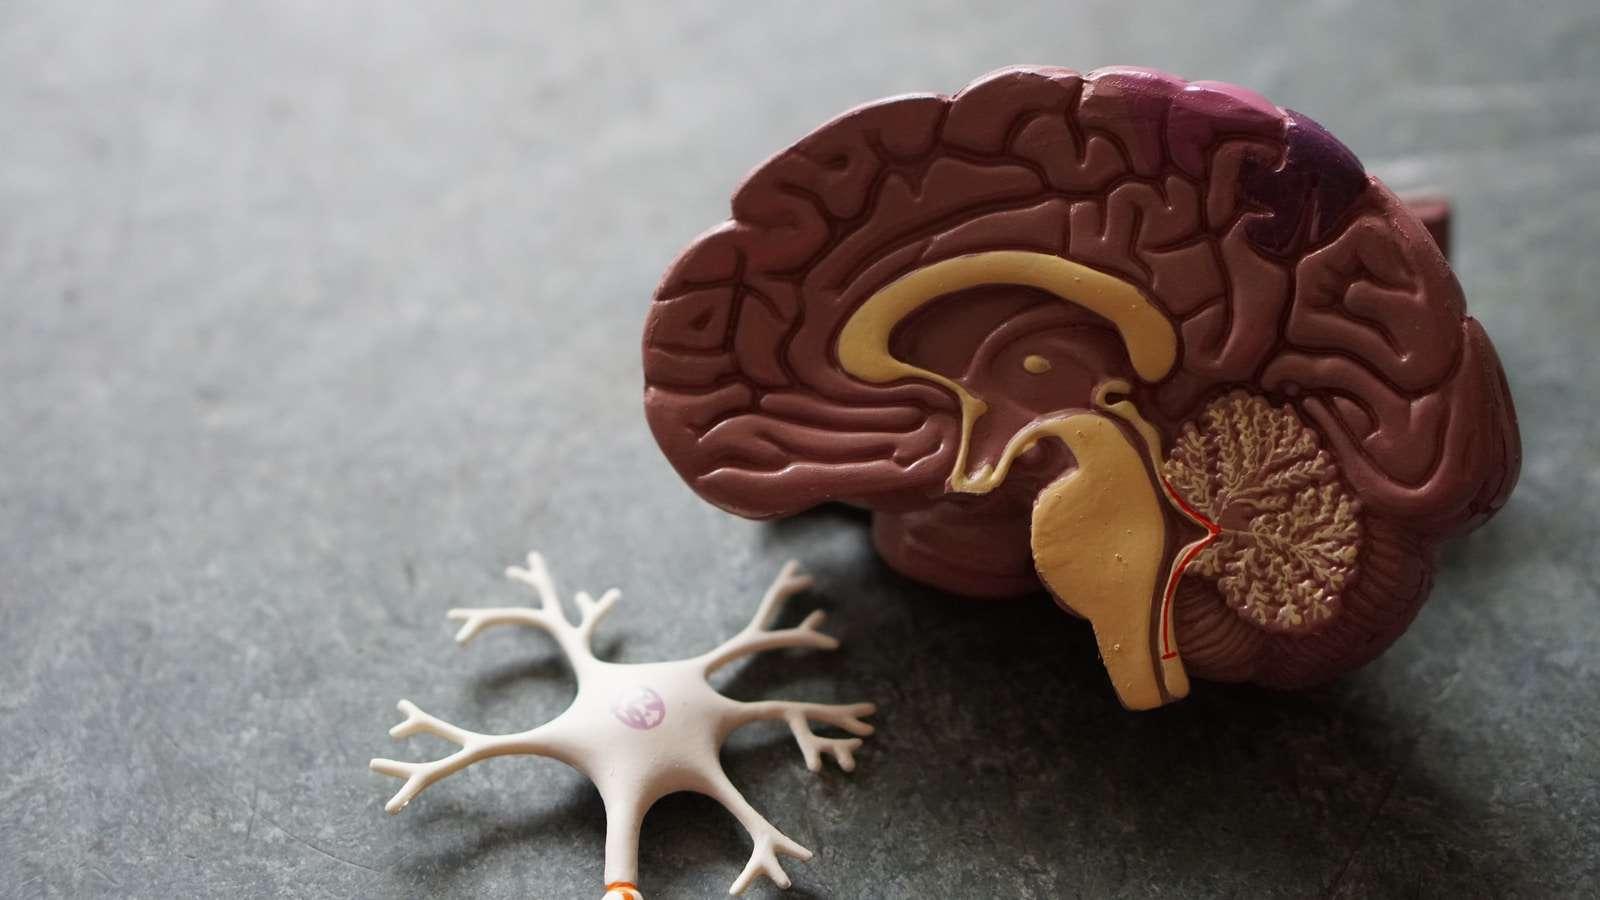 Buddah's Brain